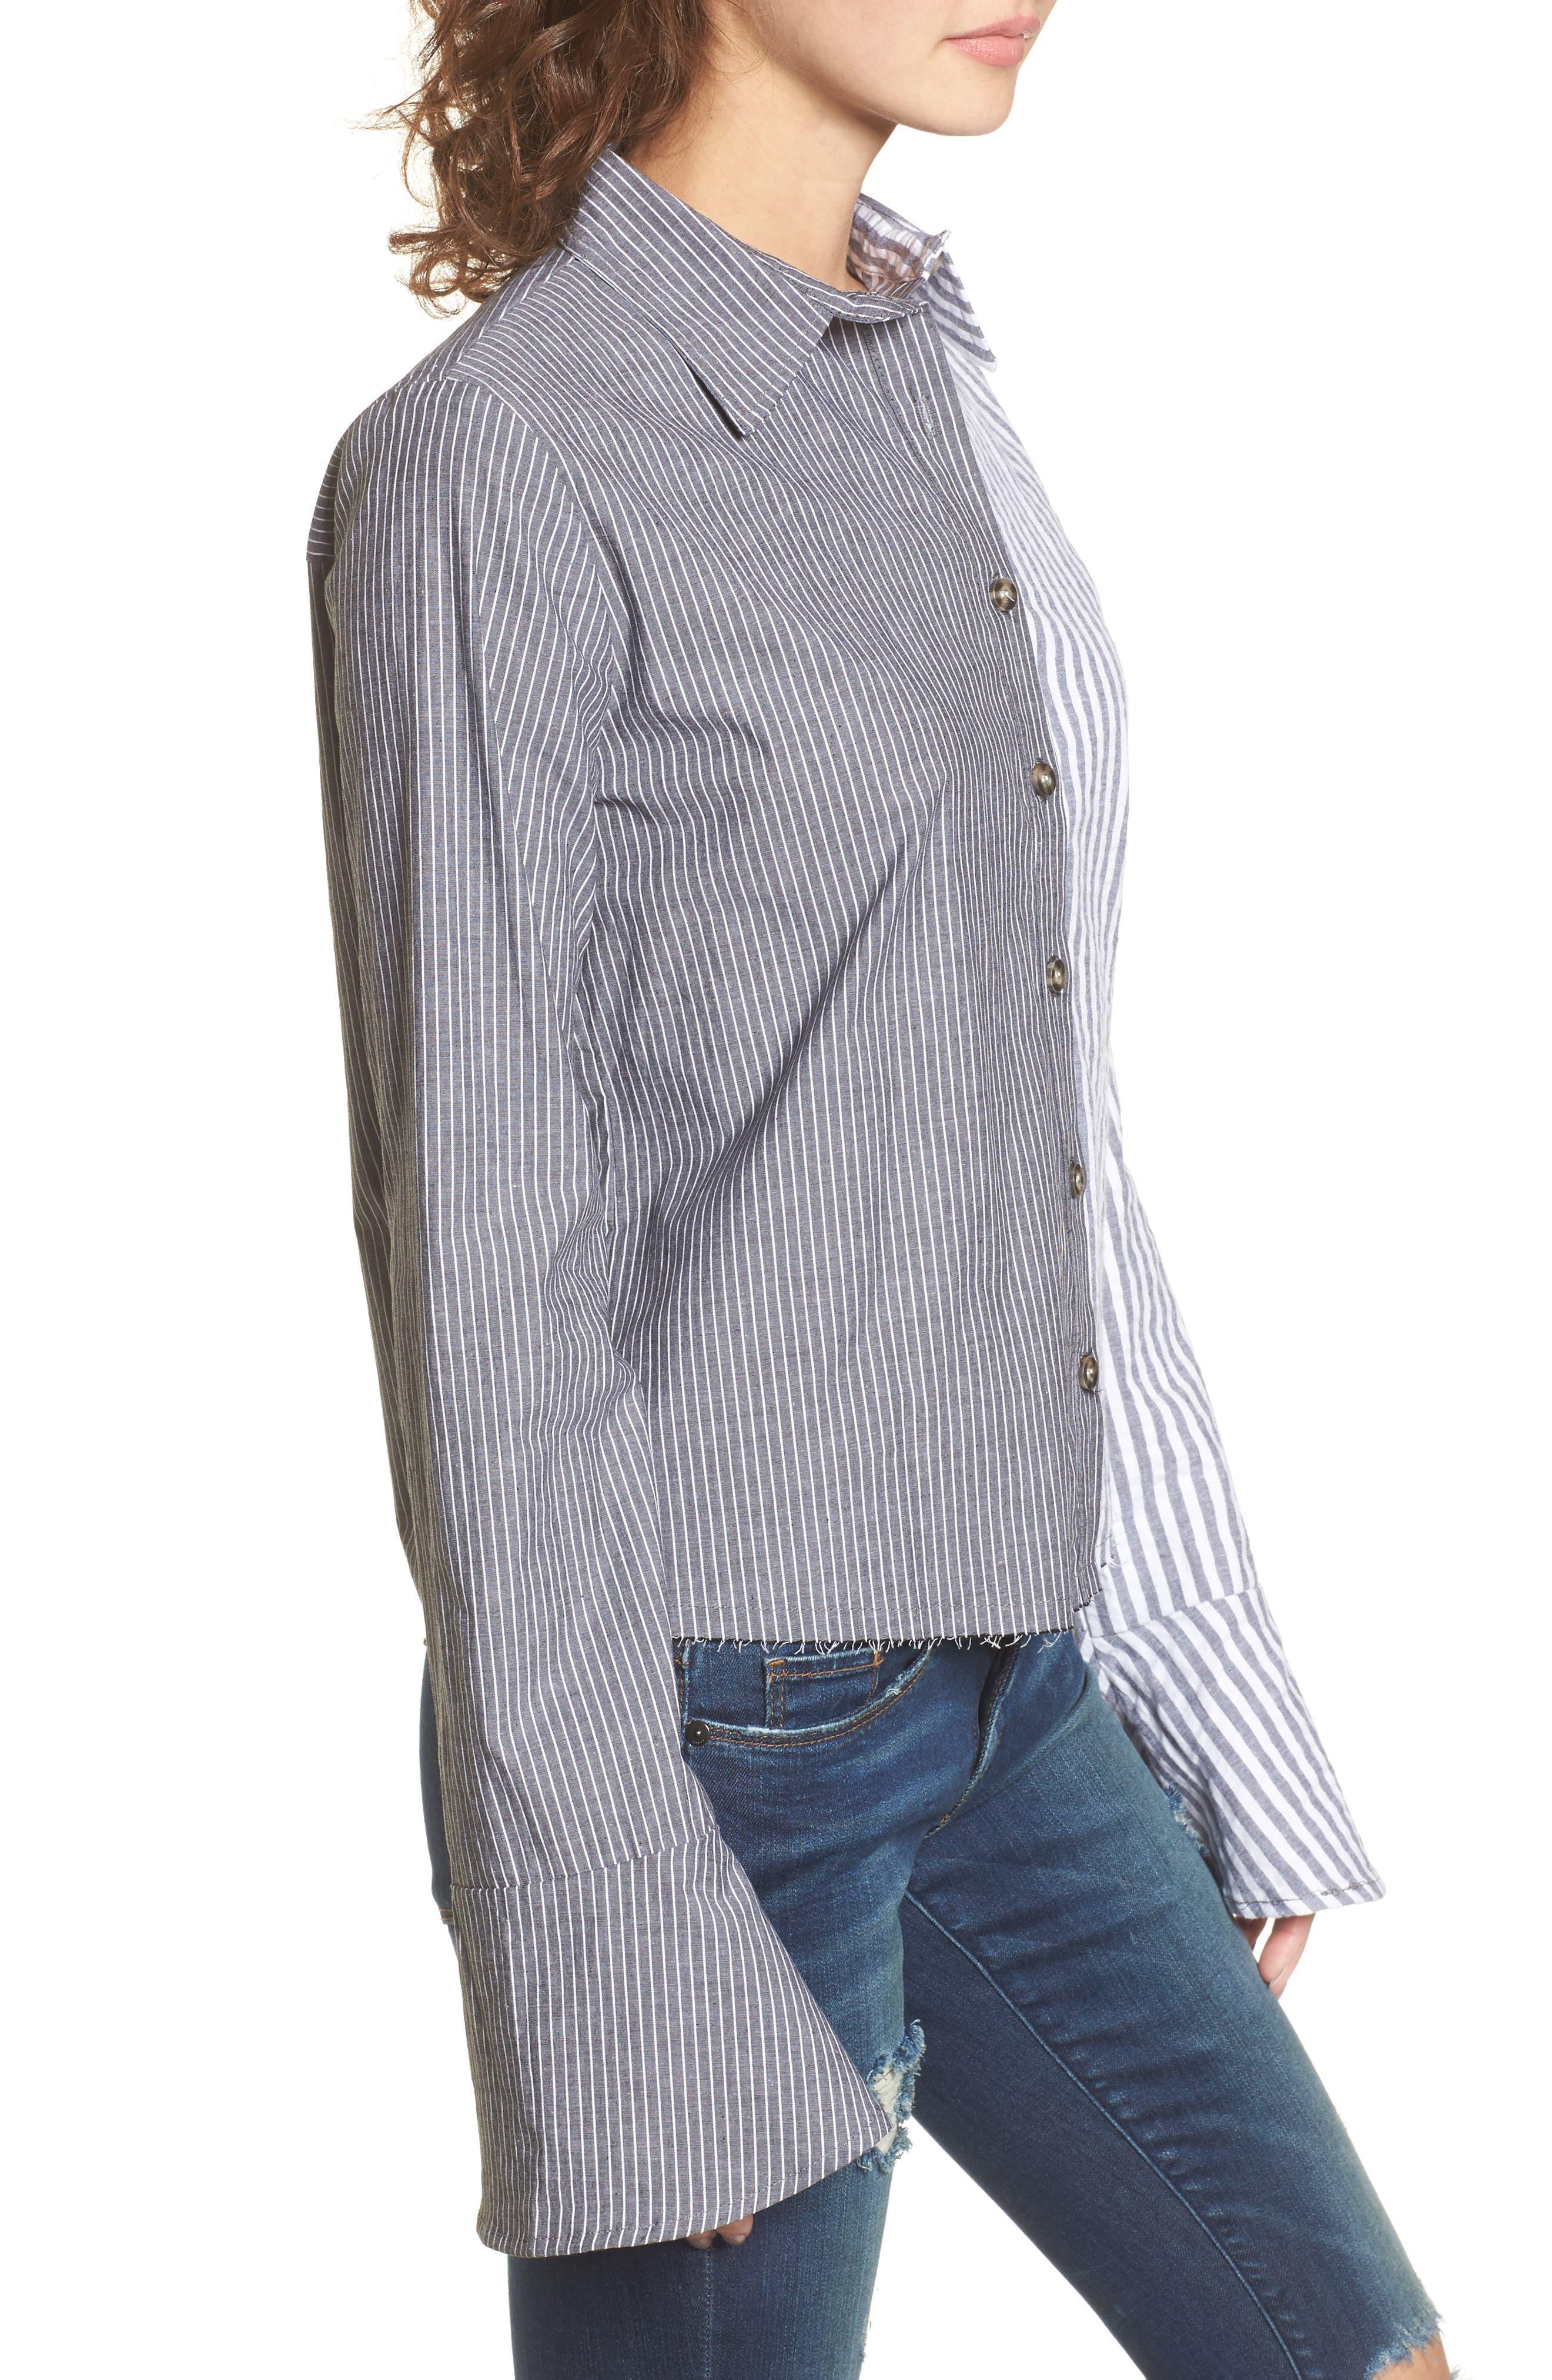 Mismatch Stripe Shirt,                             Alternate thumbnail 3, color,                             Stripe